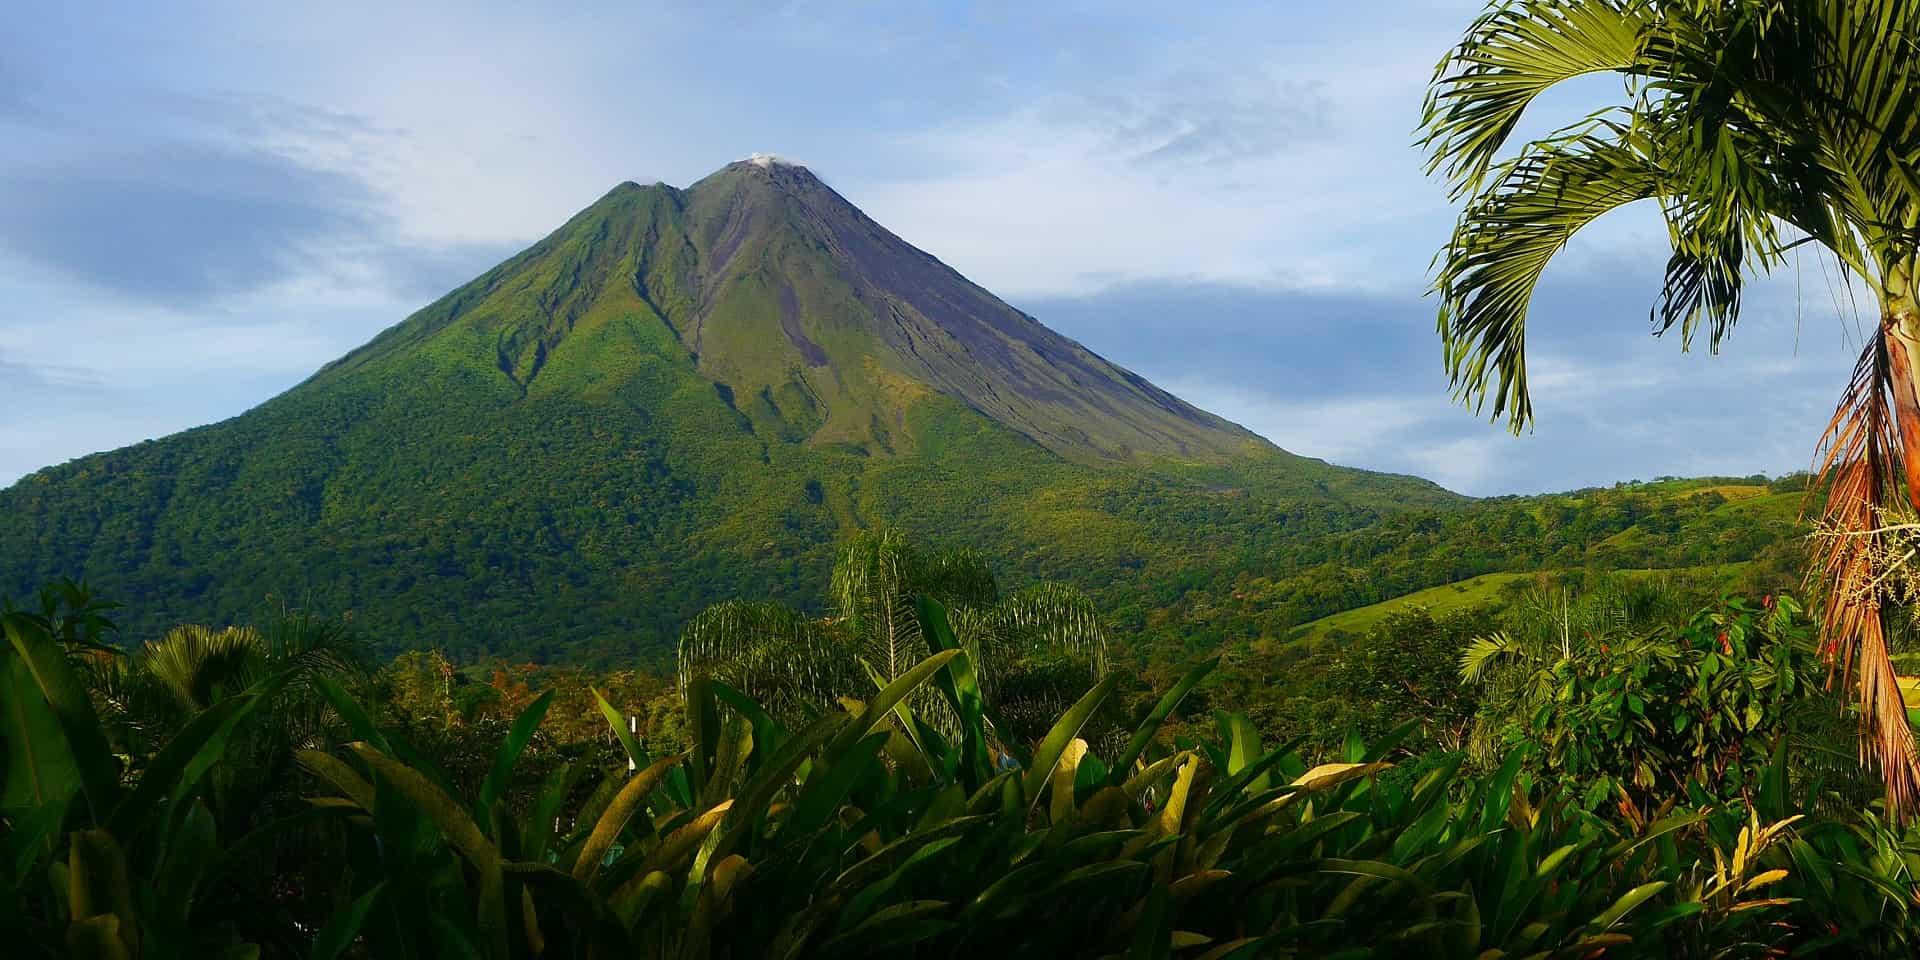 Тур в Коста Рику. Ареналь фото